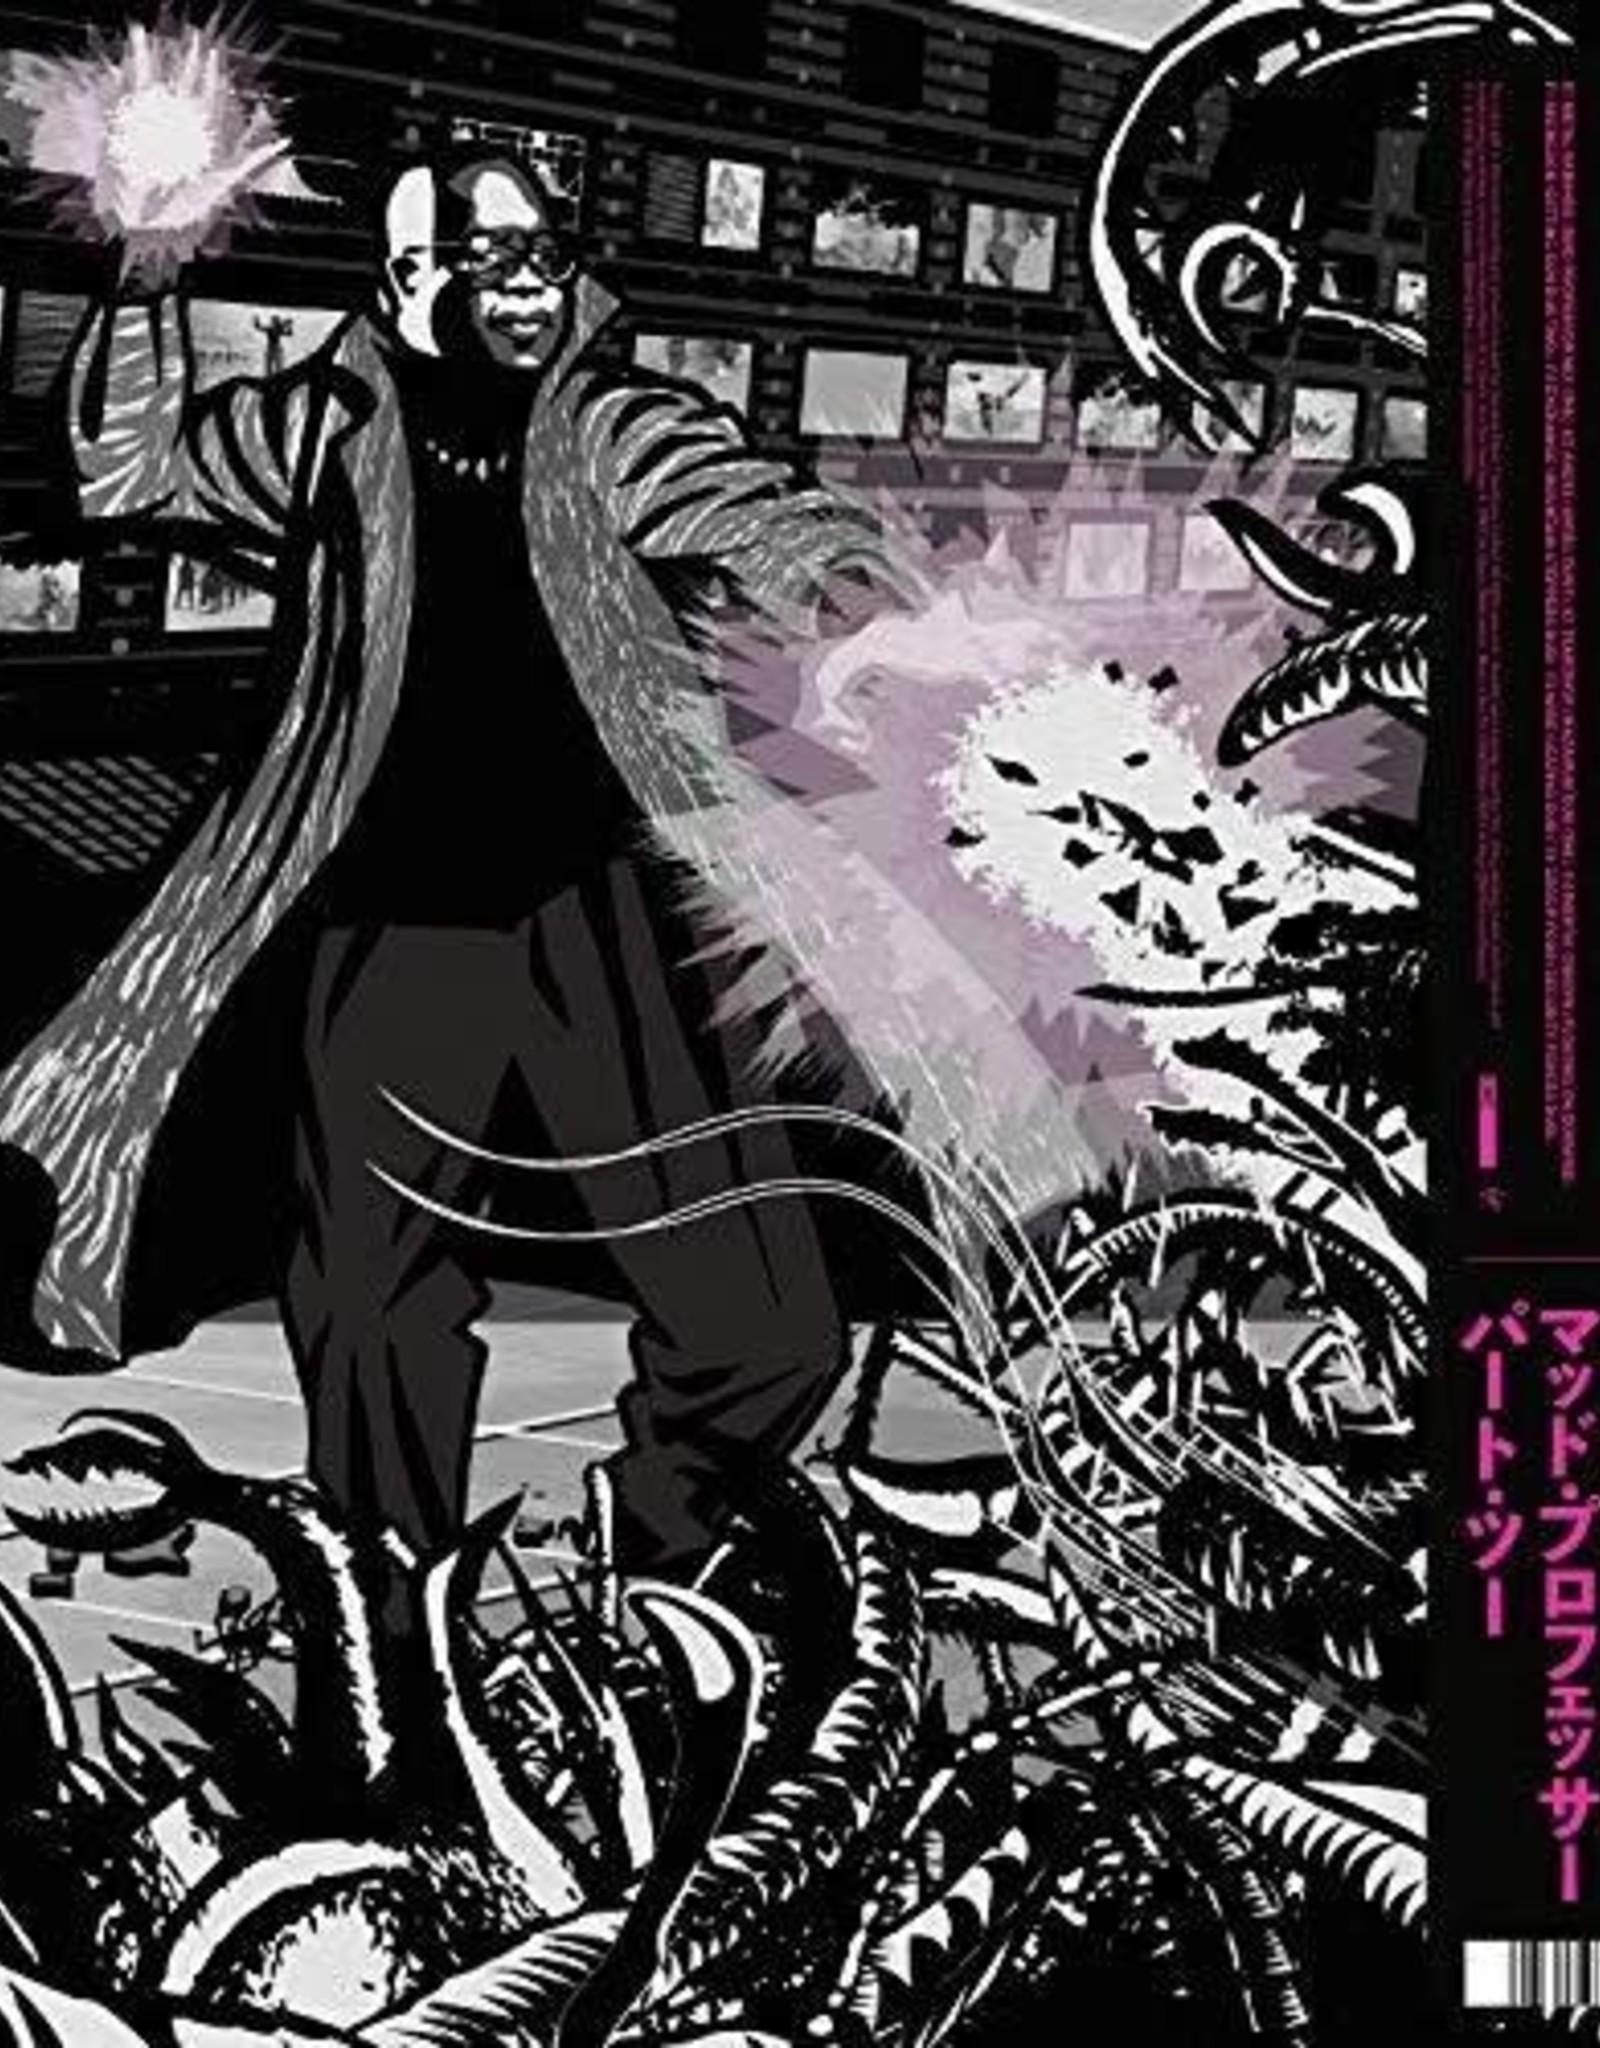 Massive Attack v Mad Professor Part II (Mezzanine Remix Tapes 98)